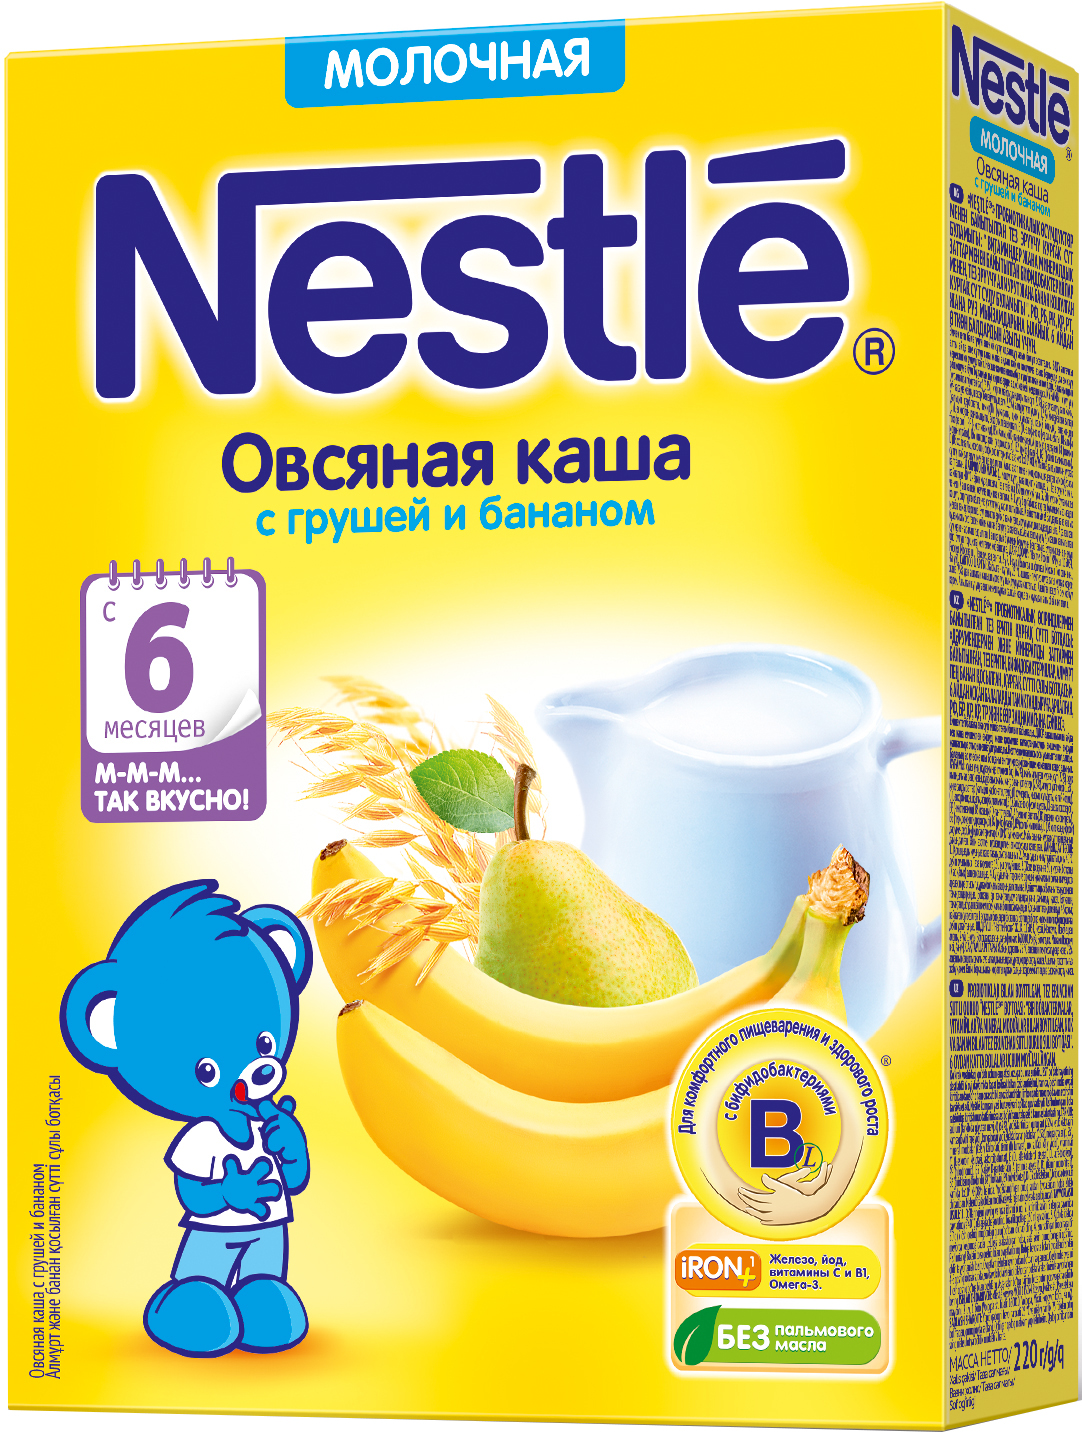 Молочные Nestle Каша молочная Nestle овсяная с грушей и бананом с 6 мес. 220 г каша молочная nestle овсяная с грушей и бананом с 6 мес 250 г